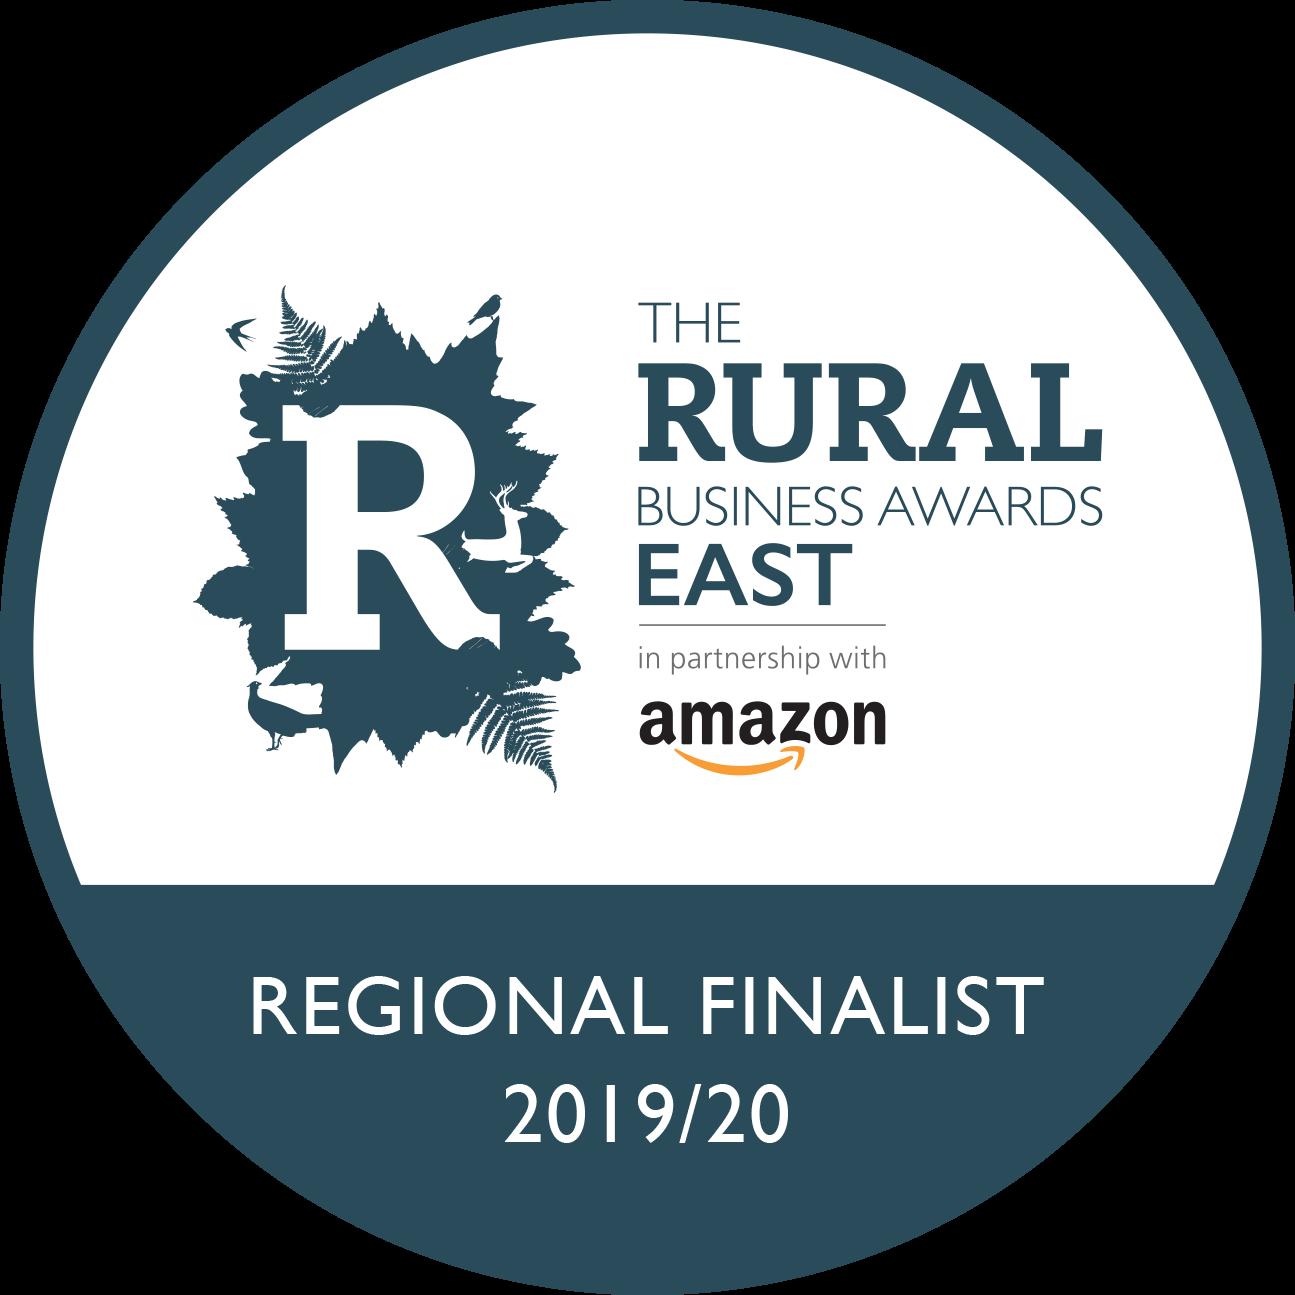 Regional-Finalist-East-2018_19_green-RGB 2019